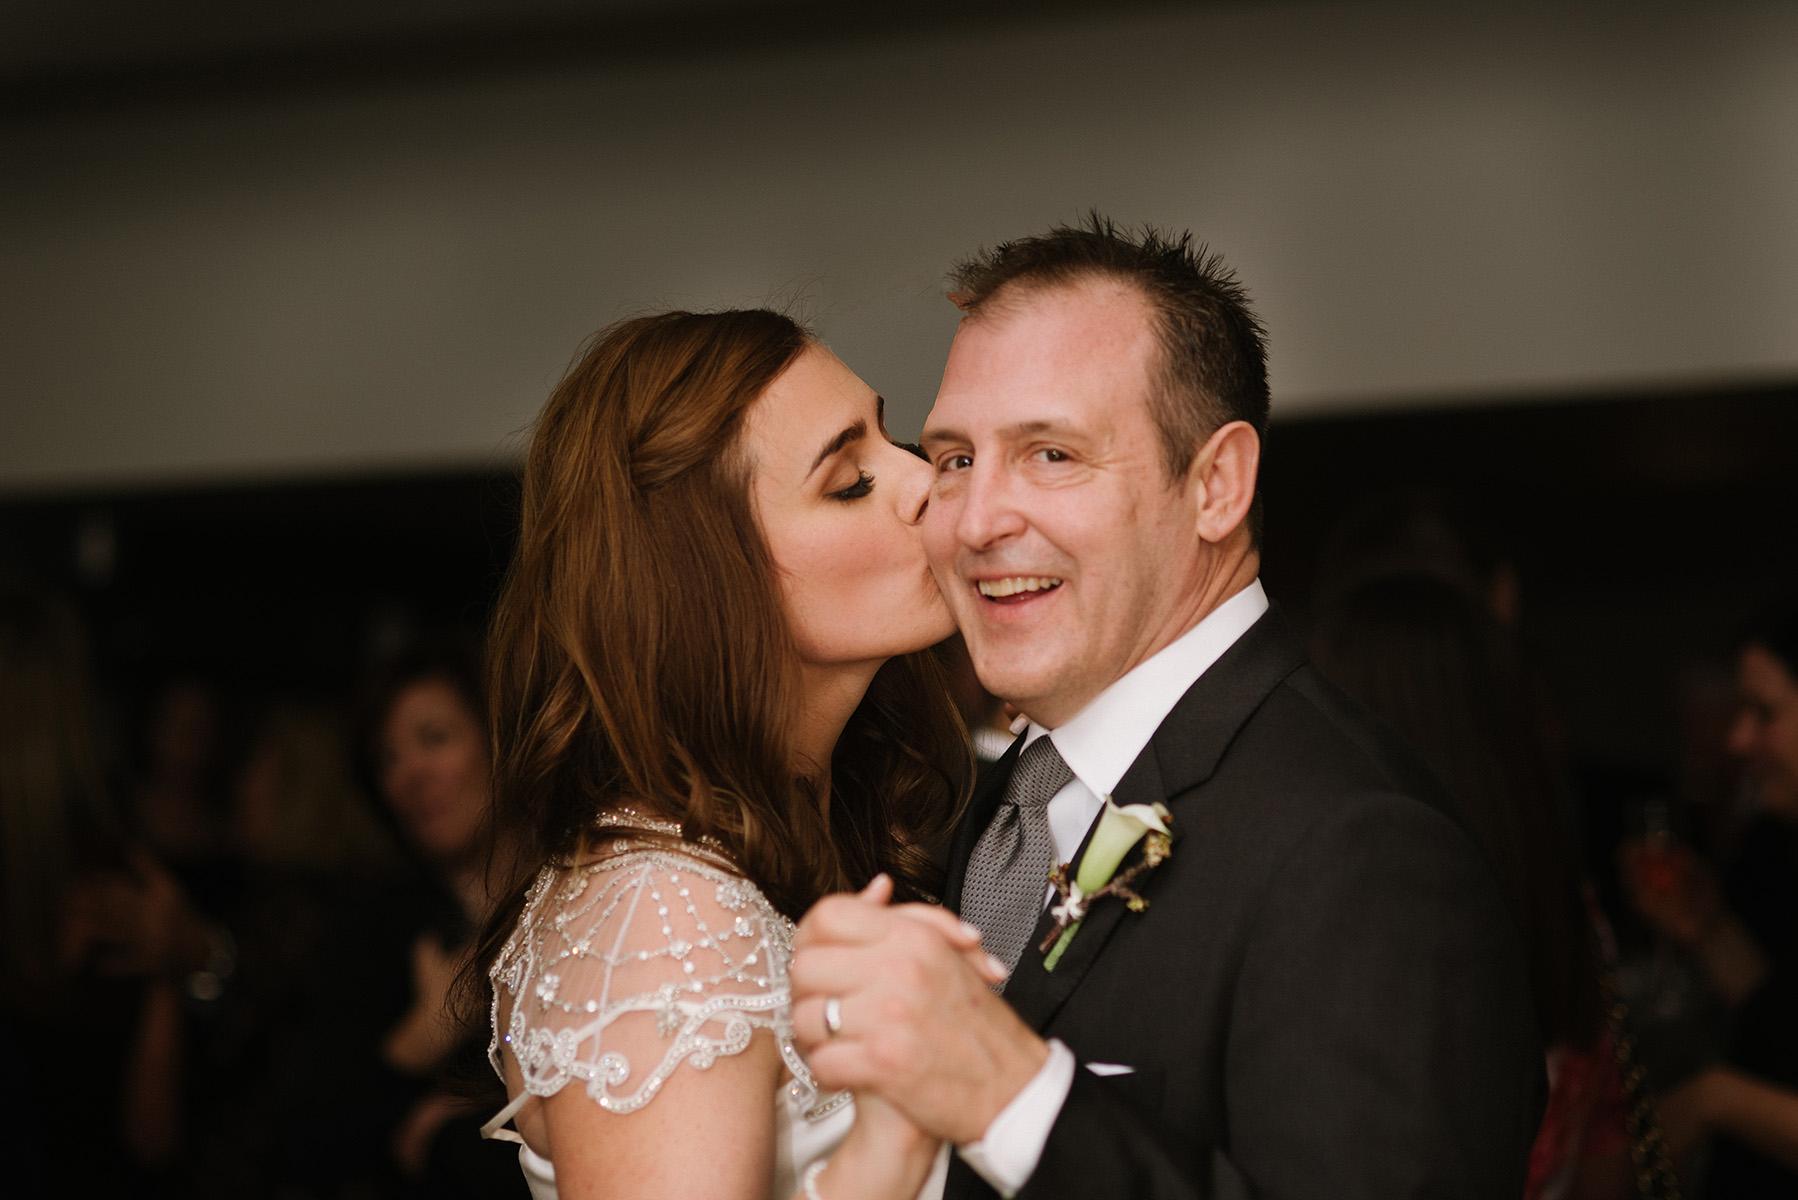 Pamela Yasuko Photography - A New Leaf Wedding - Chicago Oahu Photographer-56.jpg